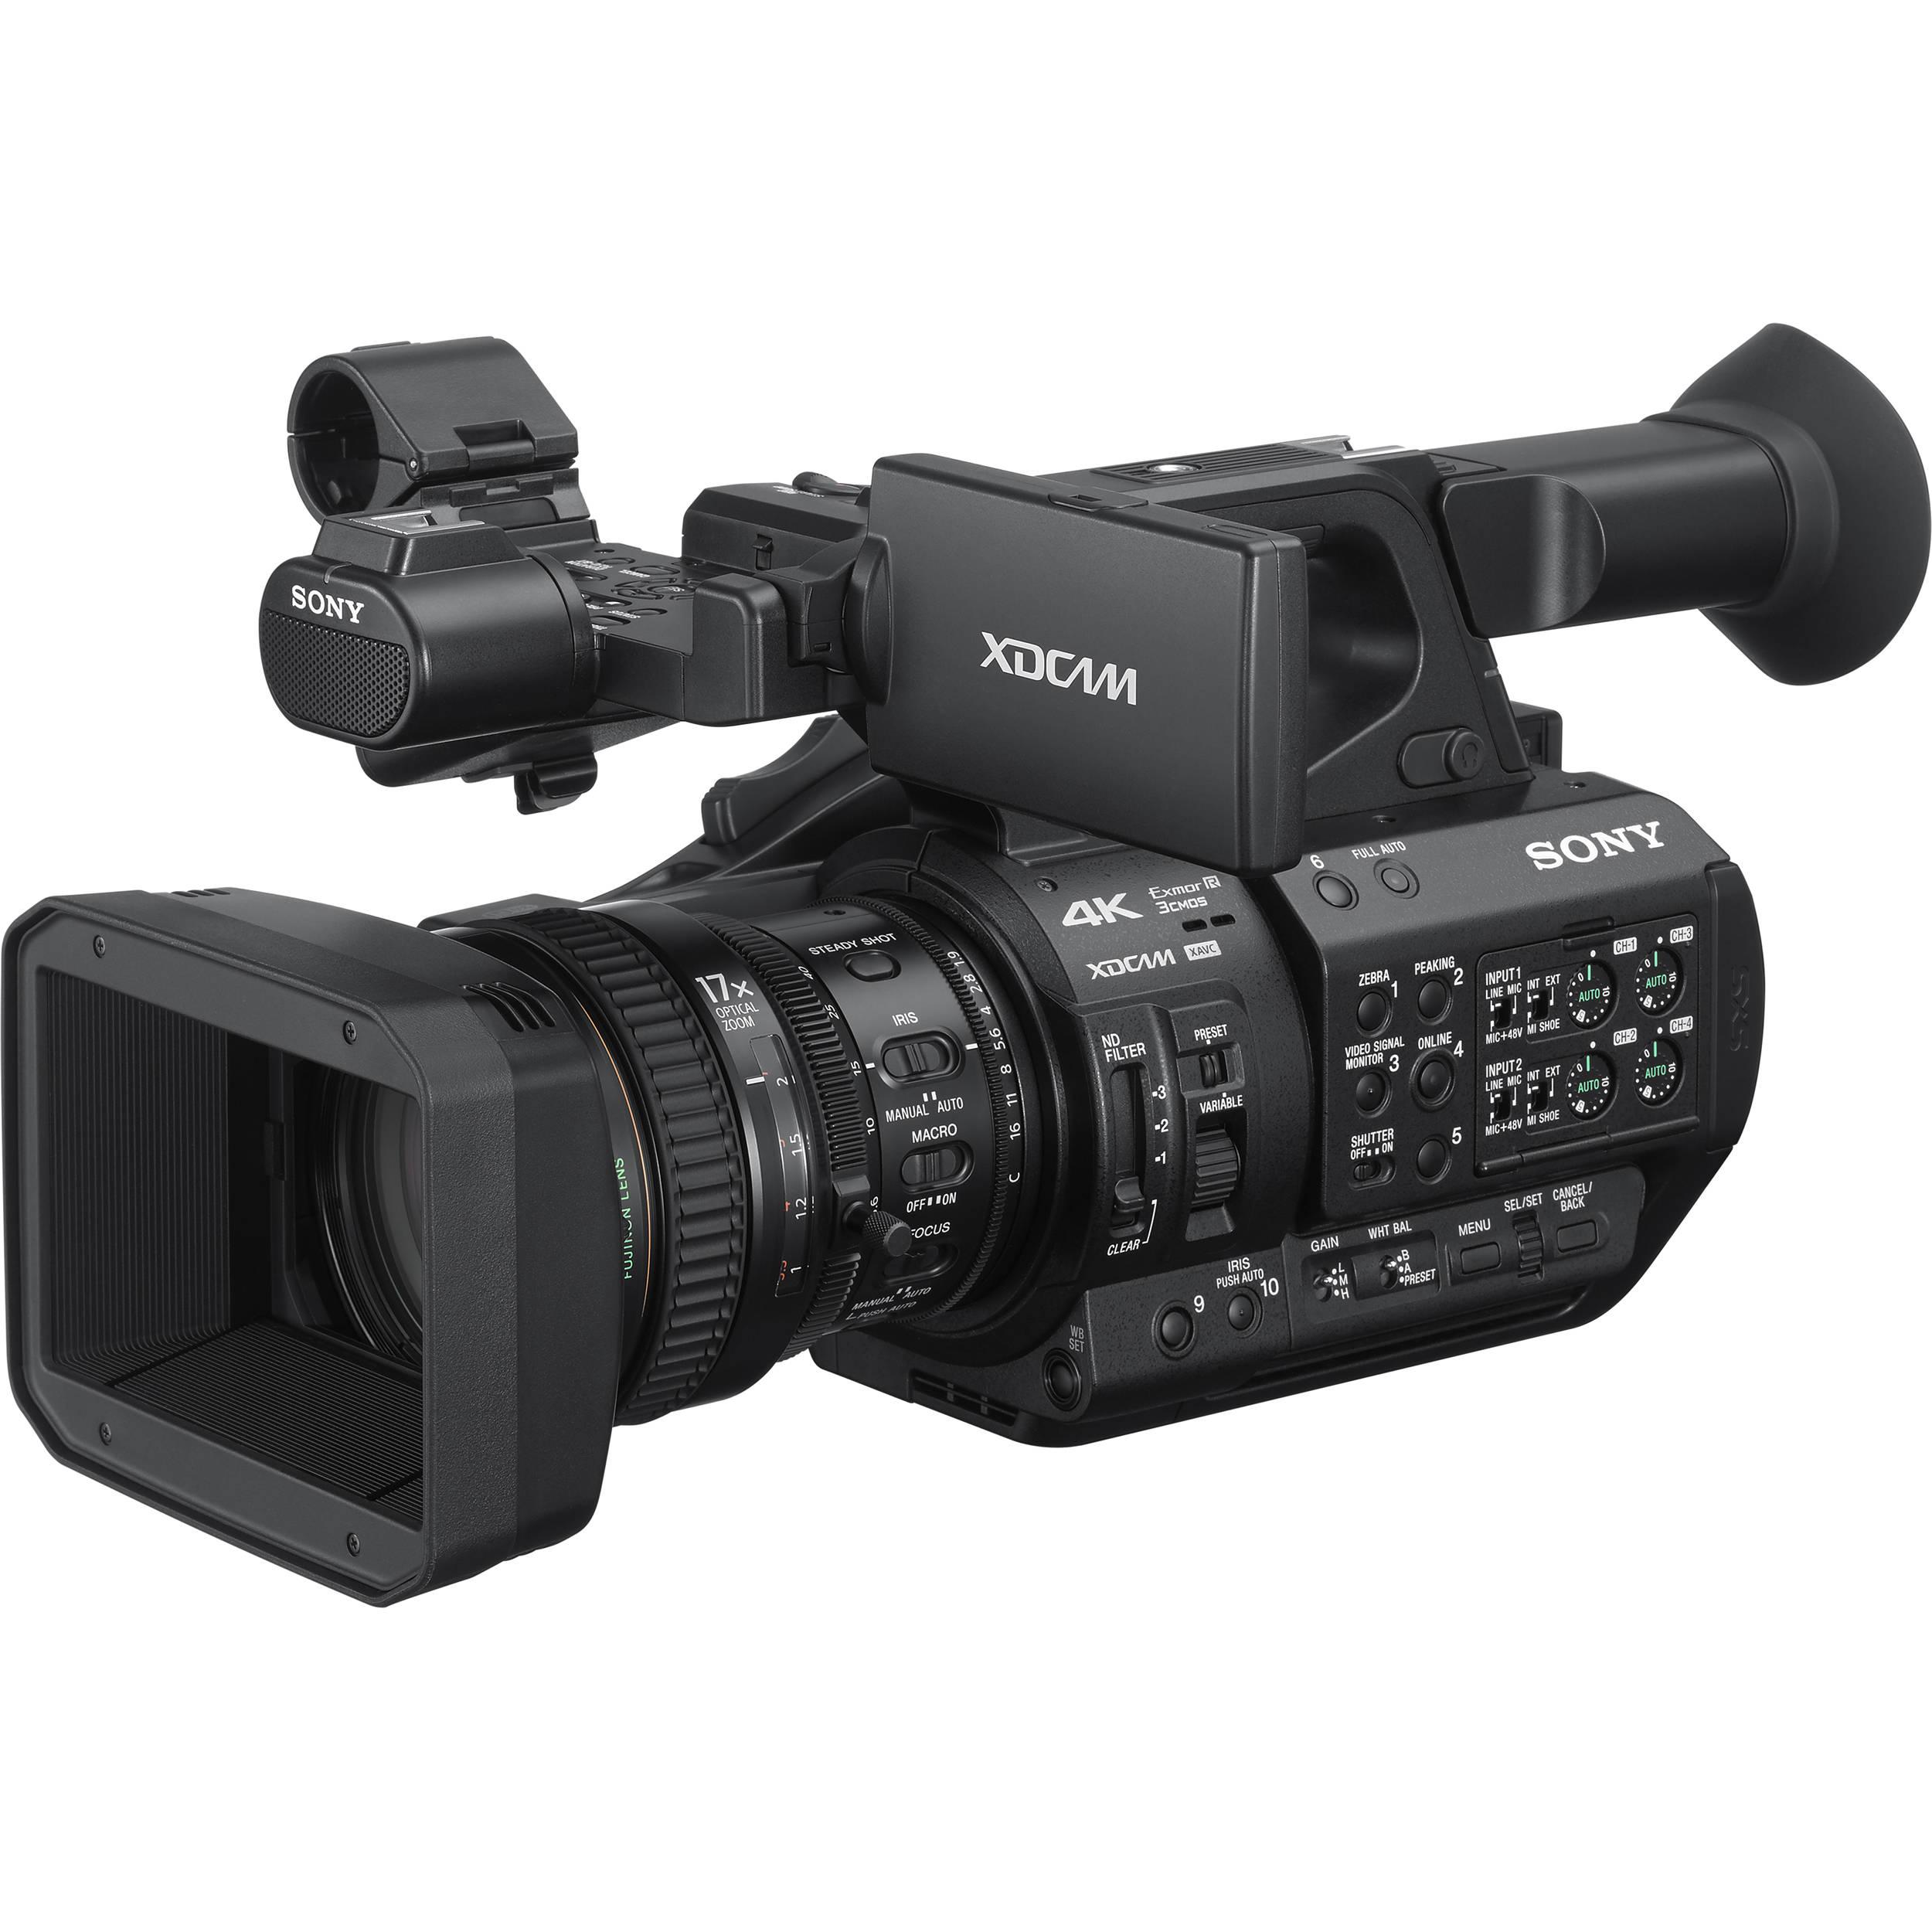 Sony Pxw Z280 4k 3 Cmos 1 2 Sensor Xdcam Camcorder